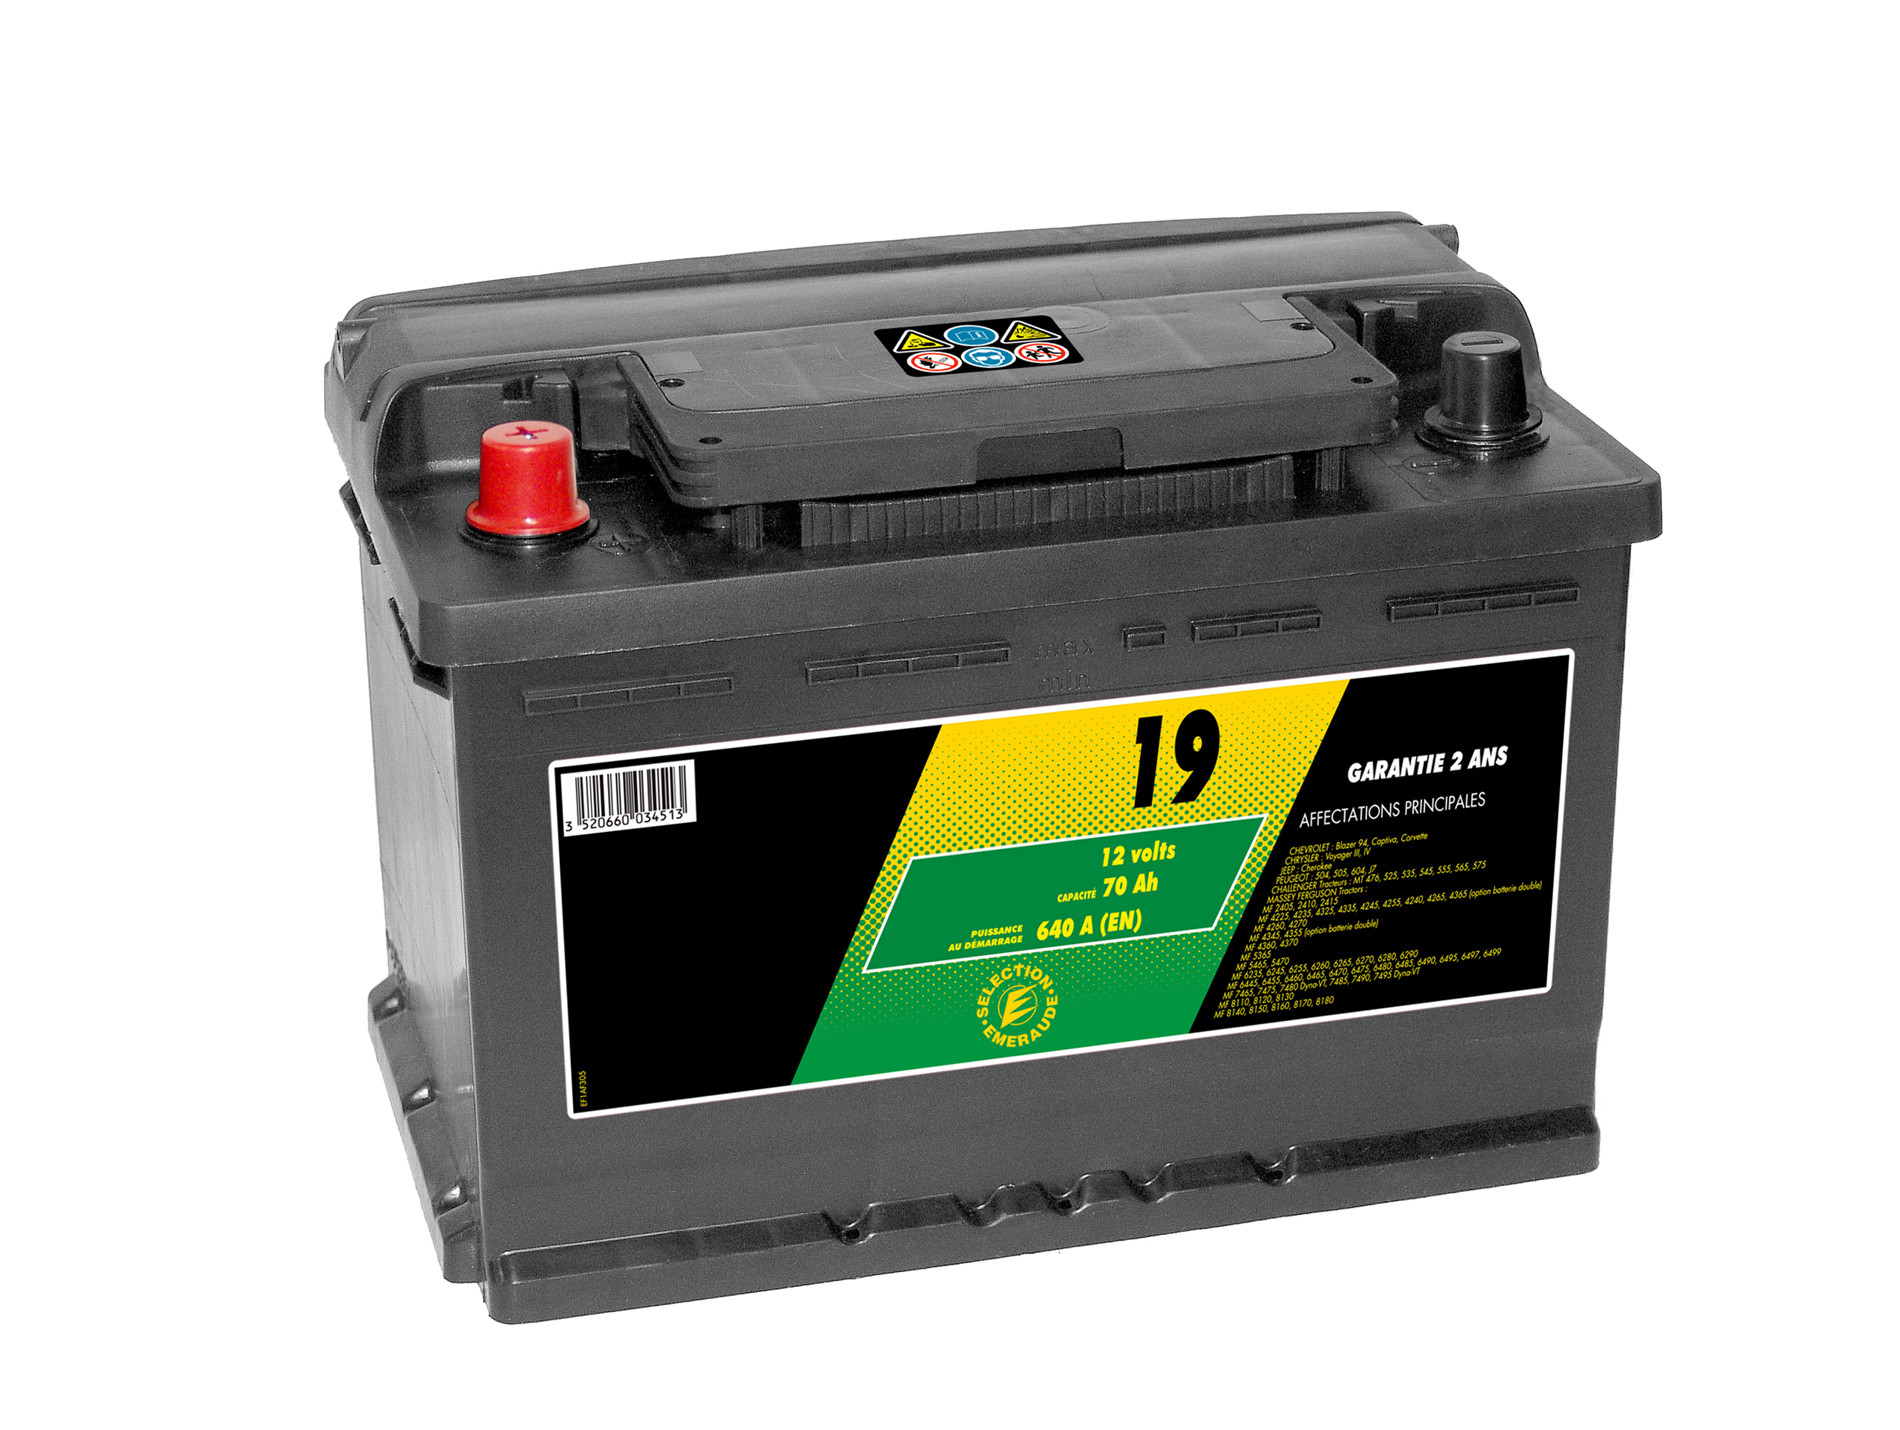 Batterie 12V N°19 Sélection Emeraude 70Ah 640A +G